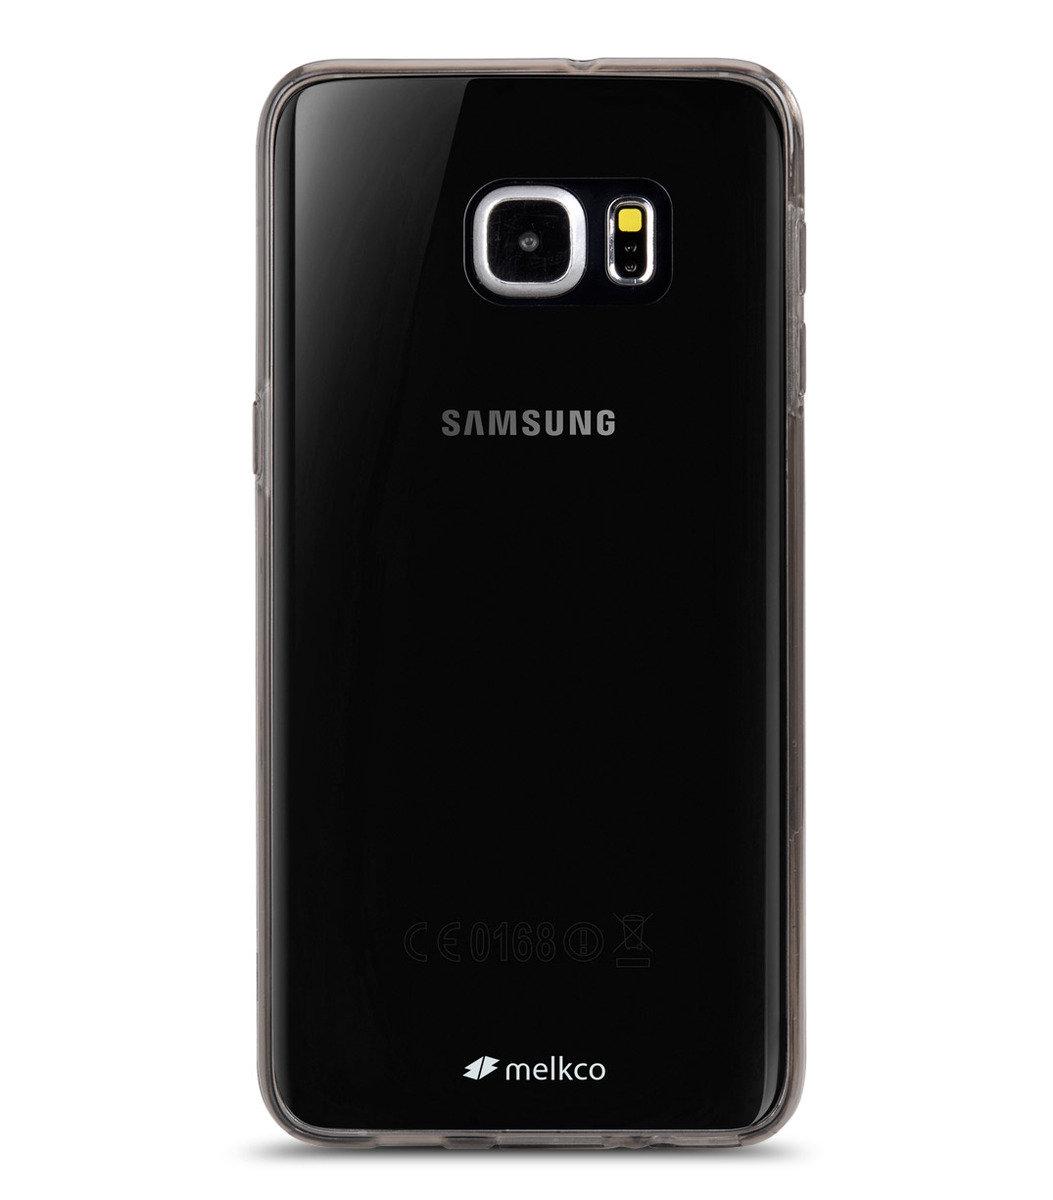 Galaxy S6 Edge Plus PolyUltima手機保護殼 - 透明黑色(附送屏幕保護貼)